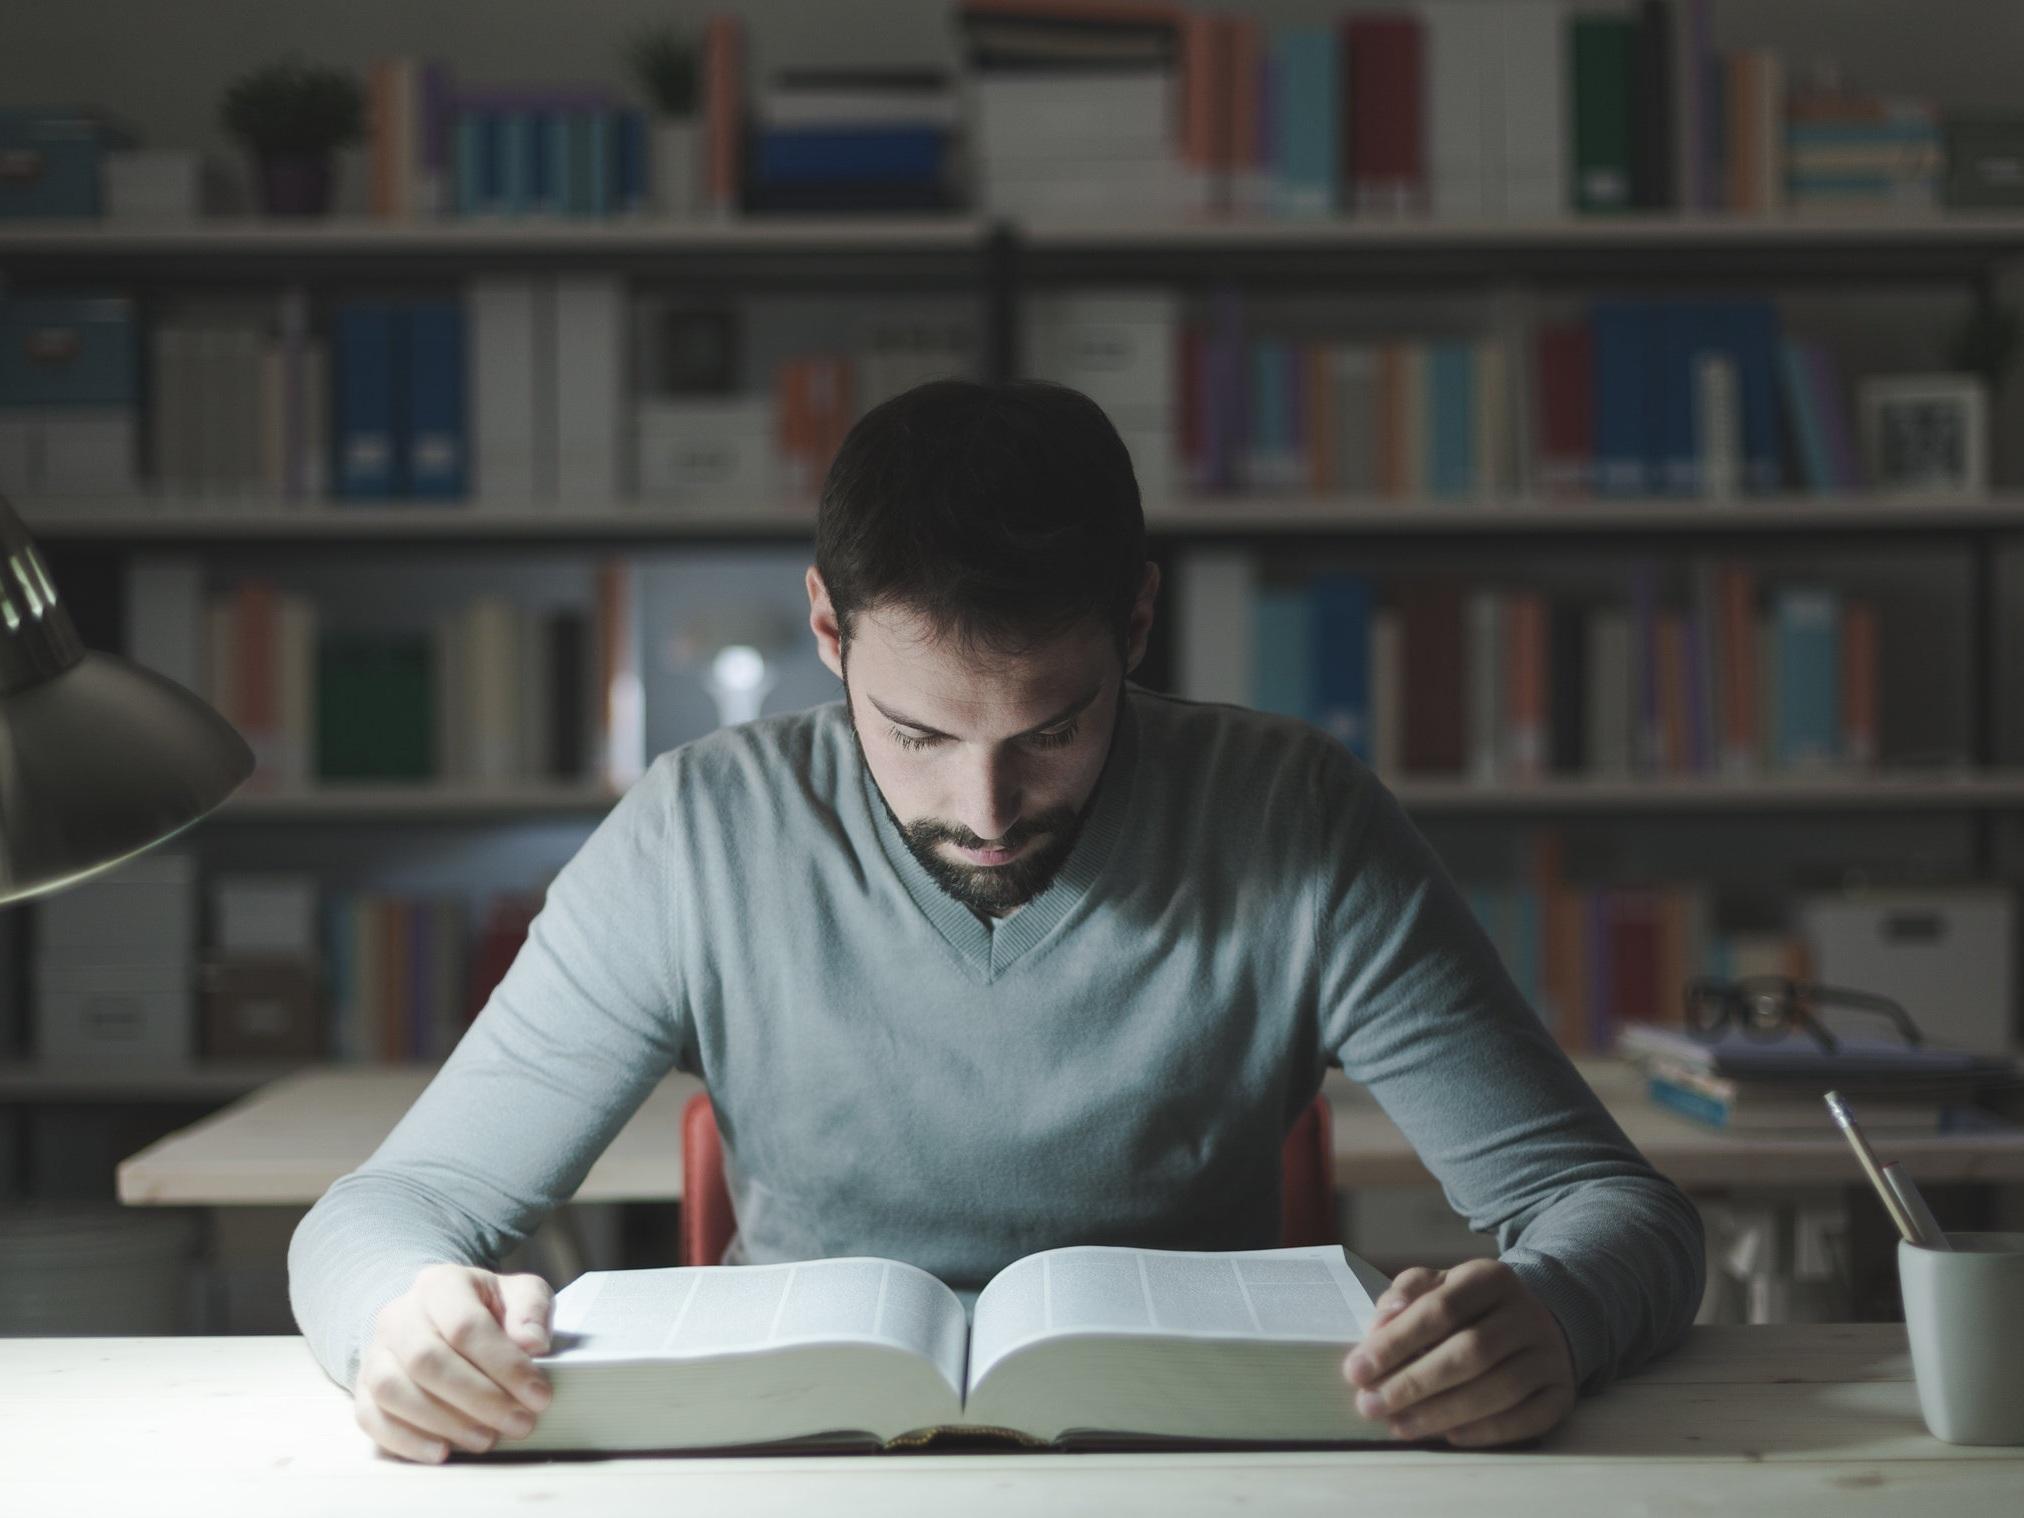 smart-man-studying-at-night-P3DMWXV.jpg